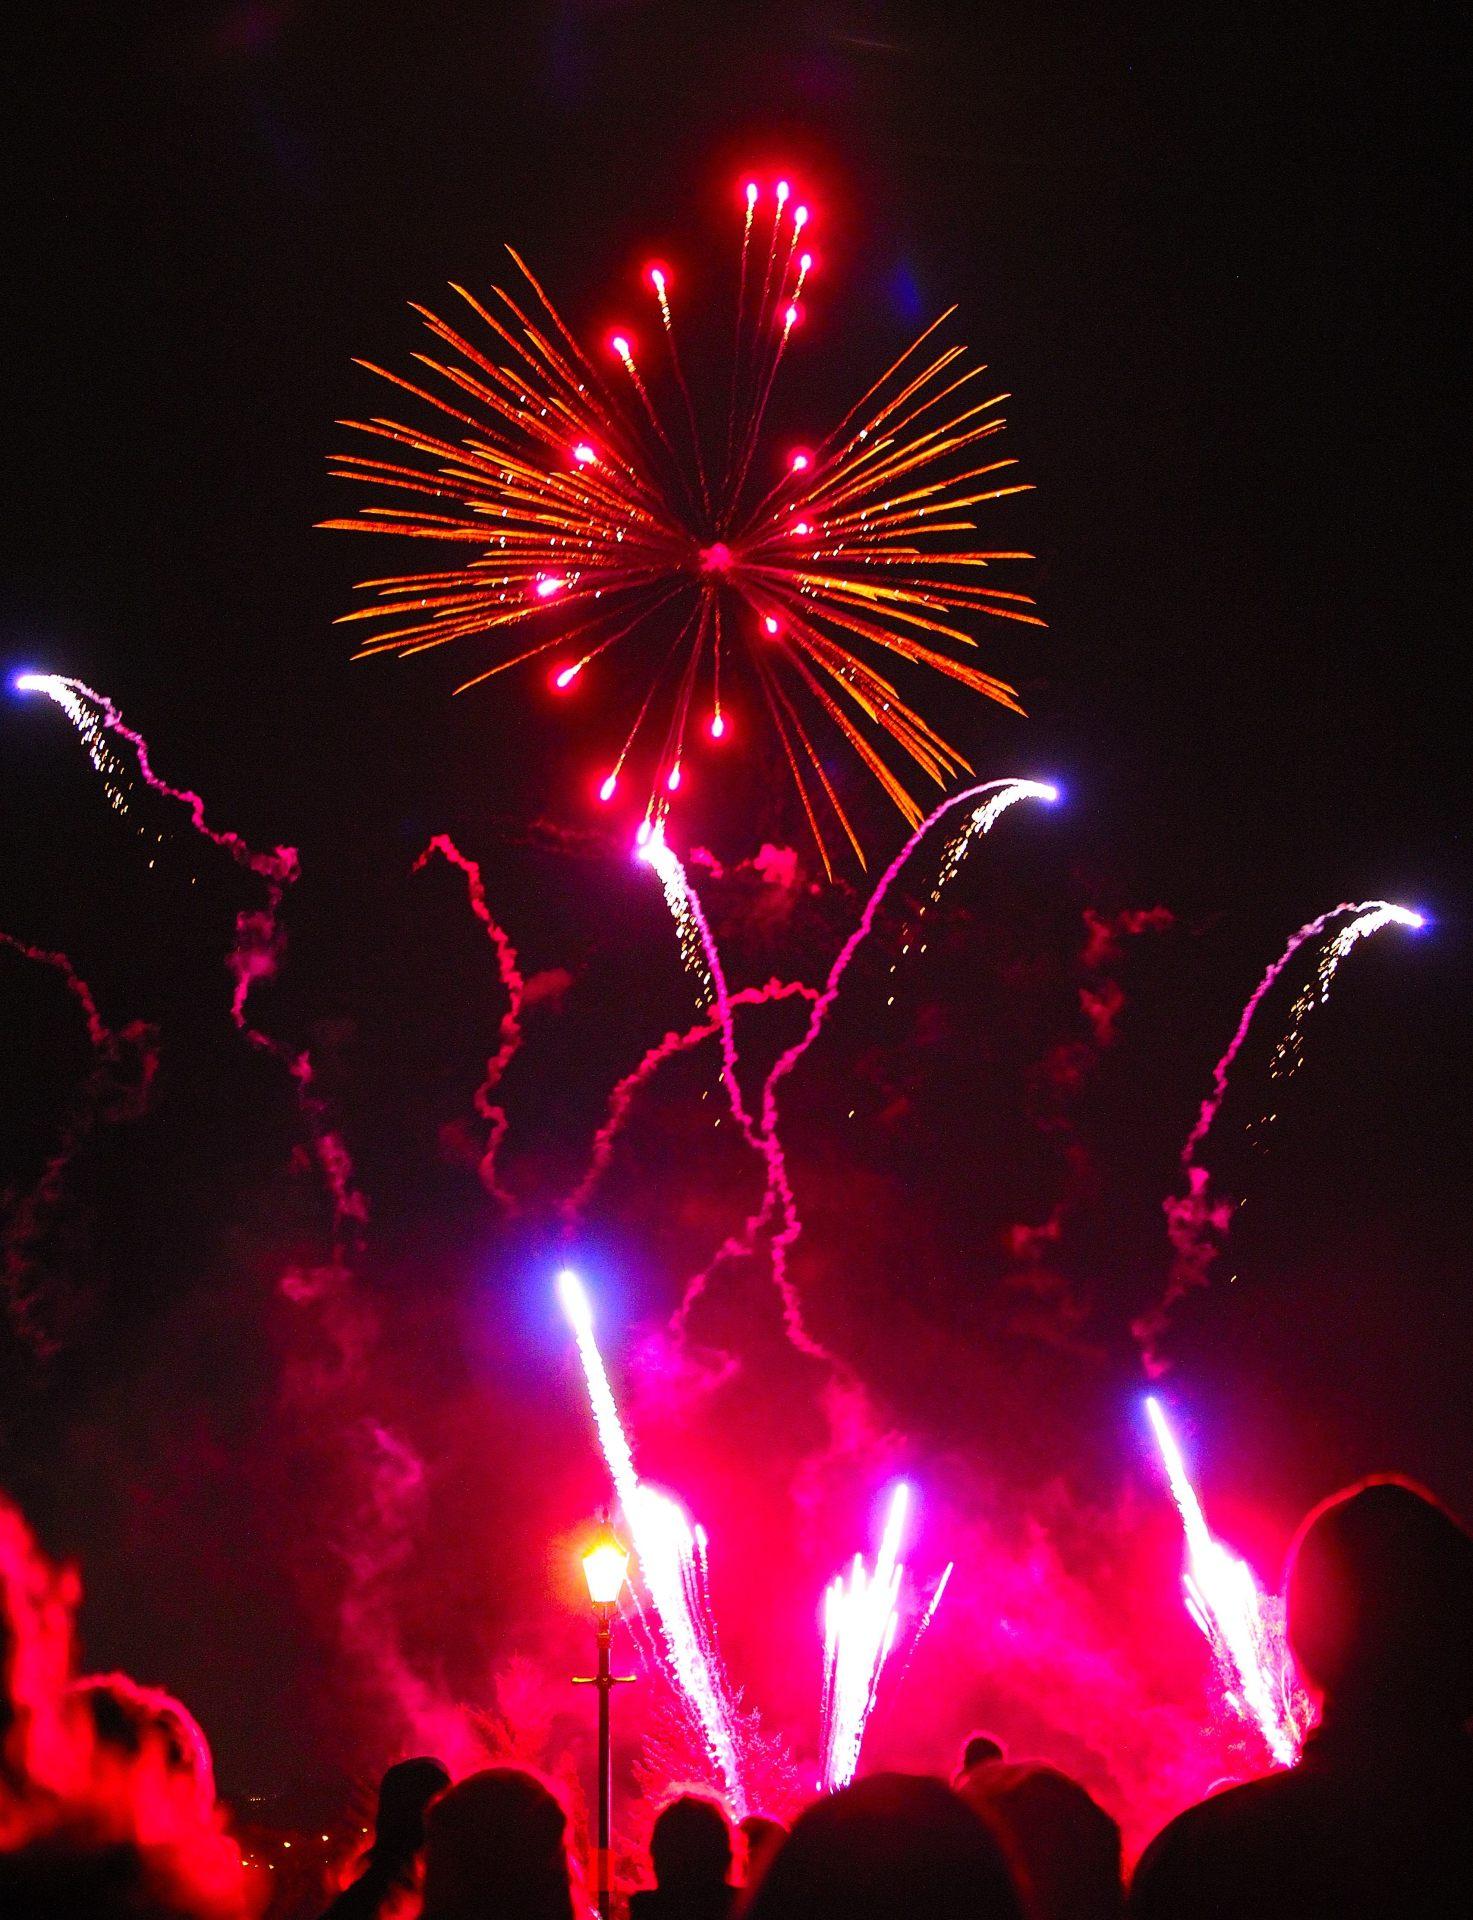 Dunfermline fireworks display Novmber 2016